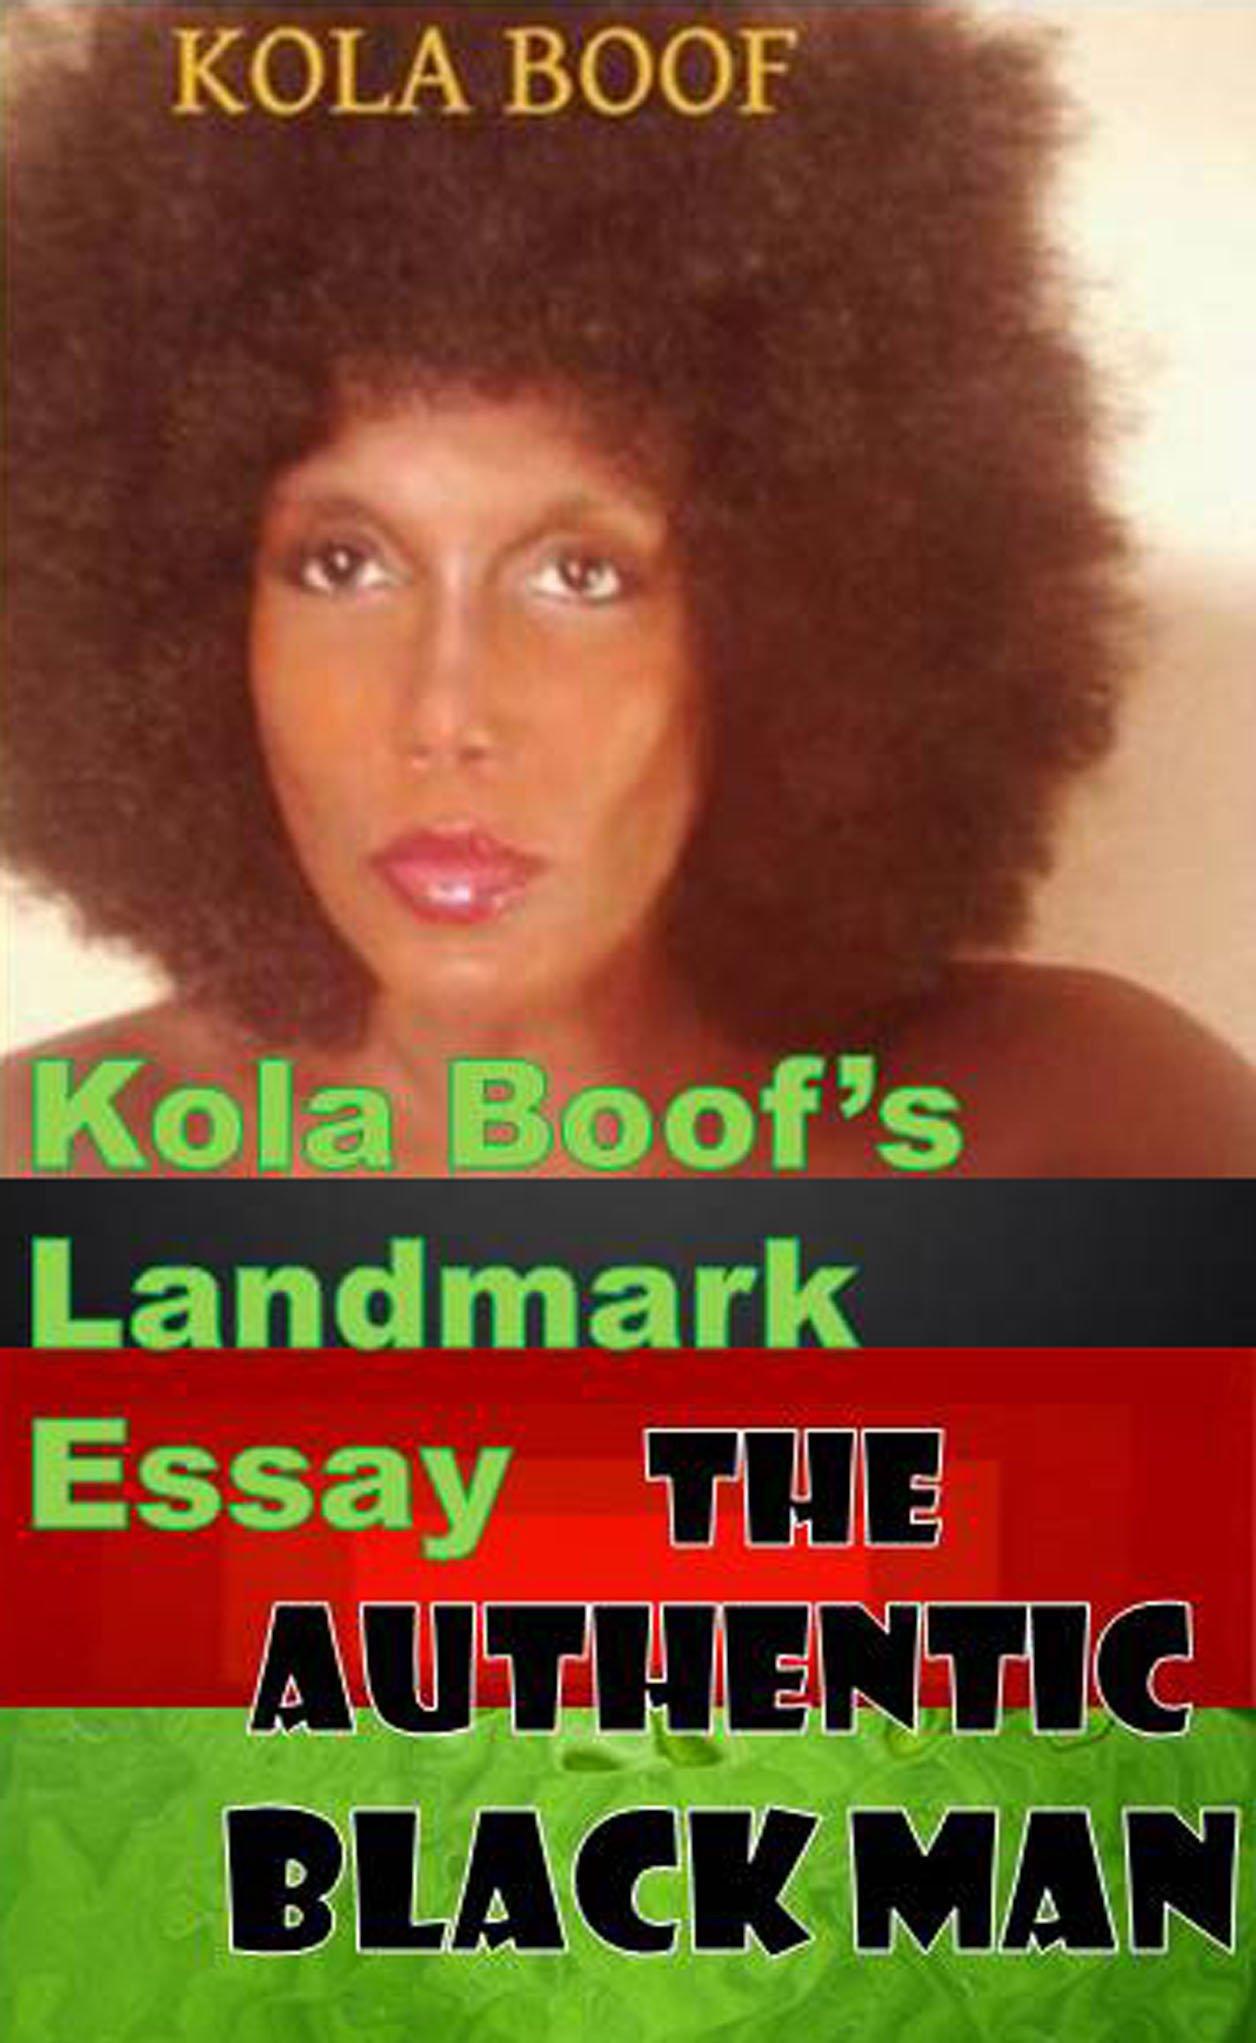 Kola Boof Lion Kola Boof's Landmark Essay